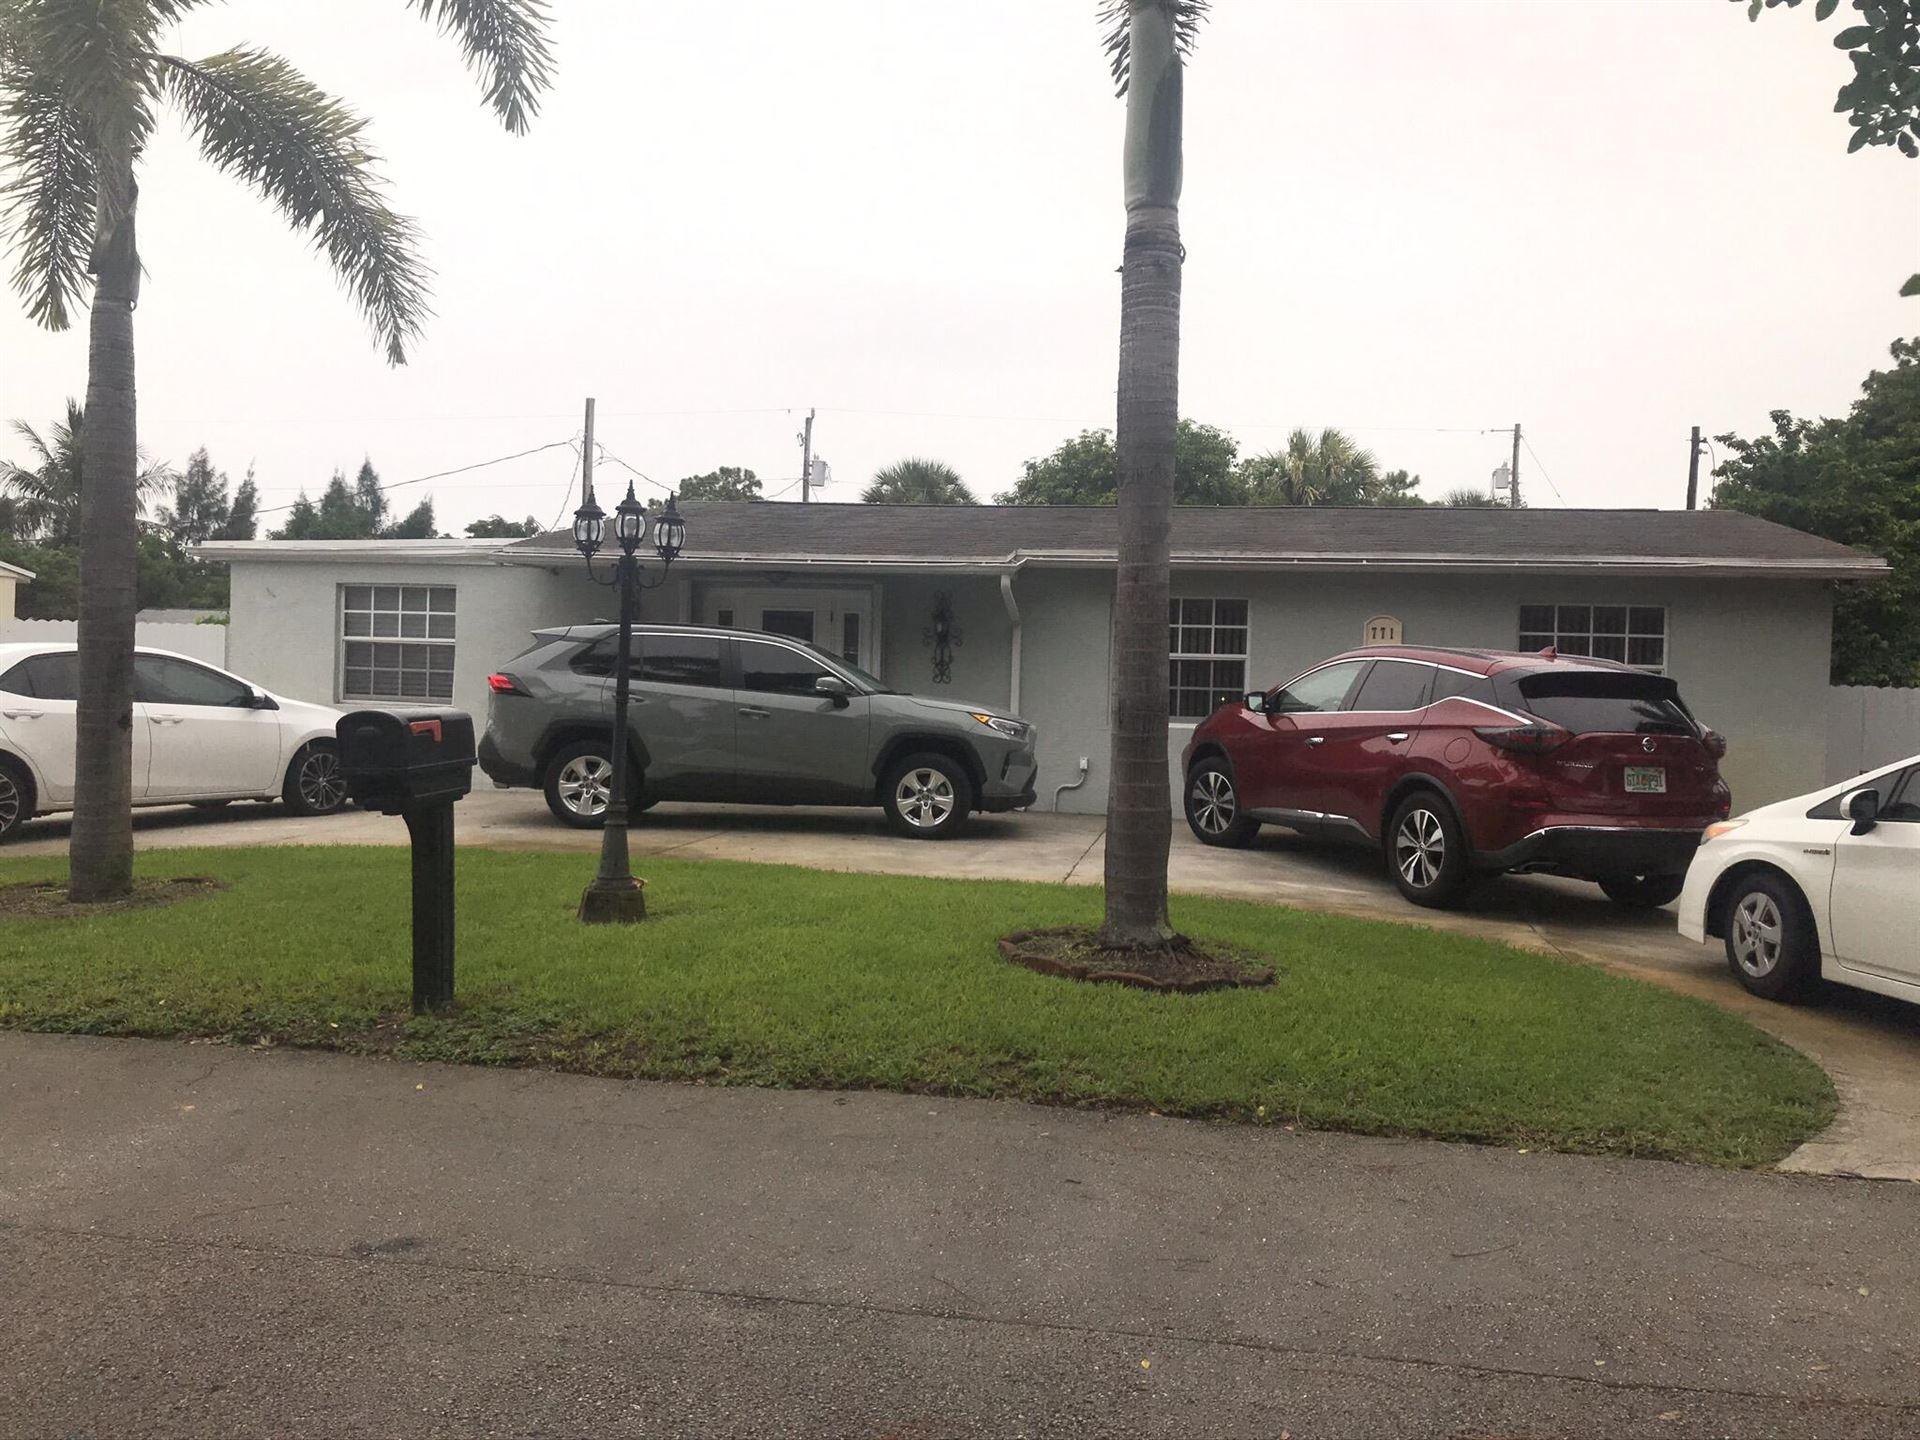 Photo of 771 Burch Drive, West Palm Beach, FL 33415 (MLS # RX-10736166)